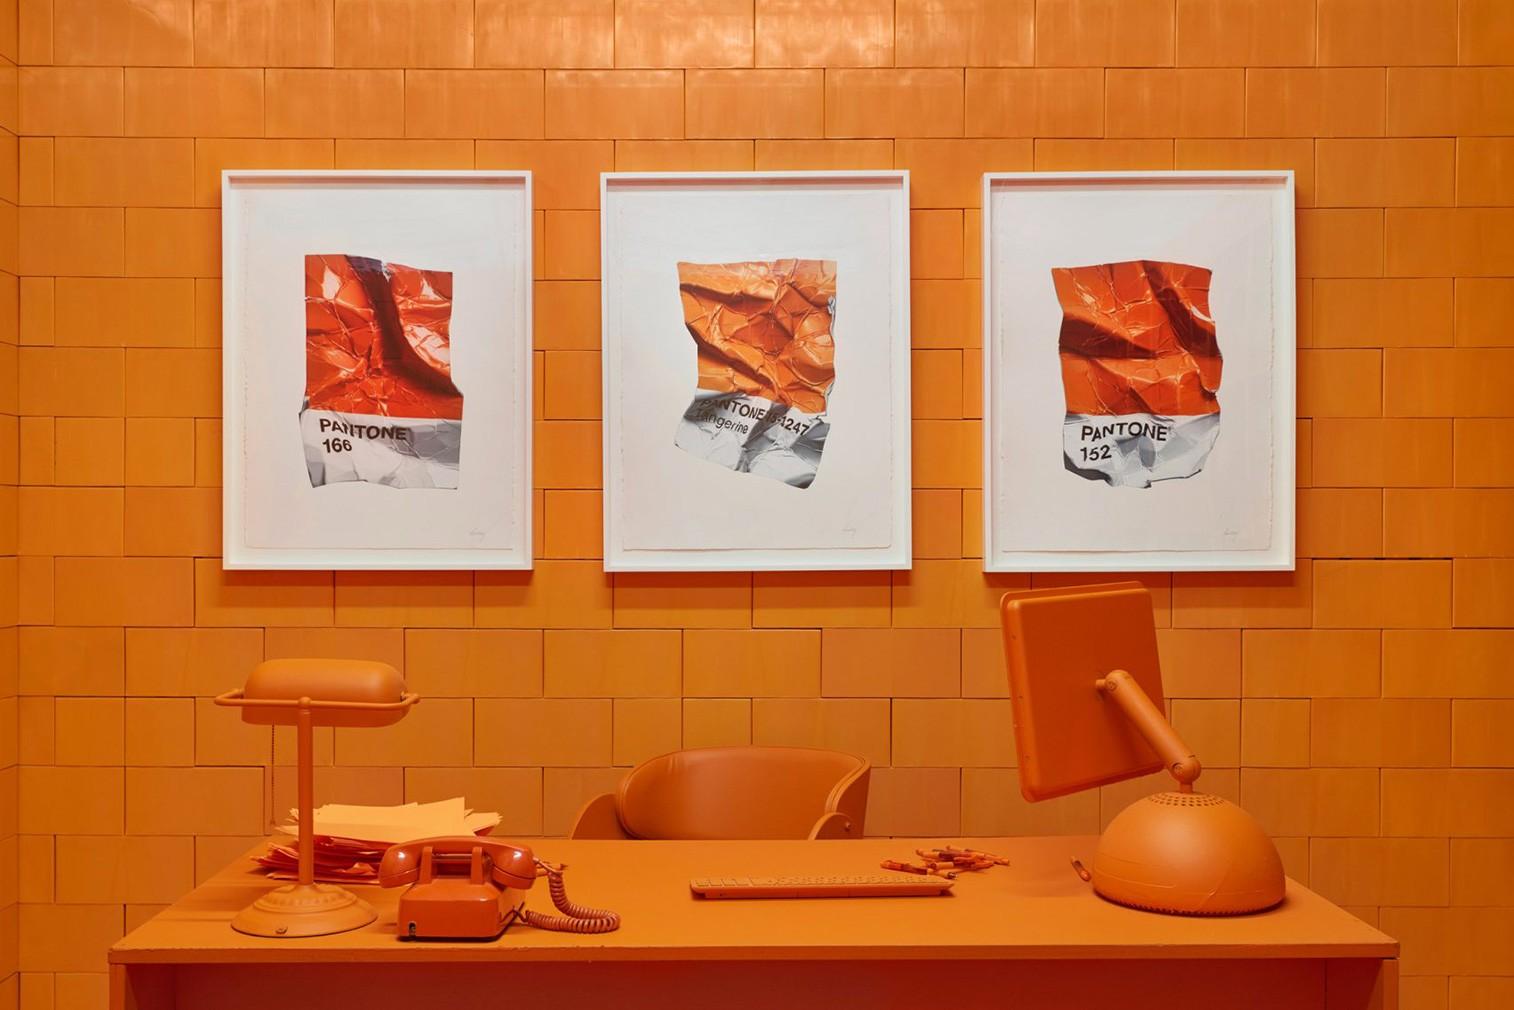 monochrome-cj-hendry-brooklyn-exhibition-colour-rooms-new-york-usa_6.jpg